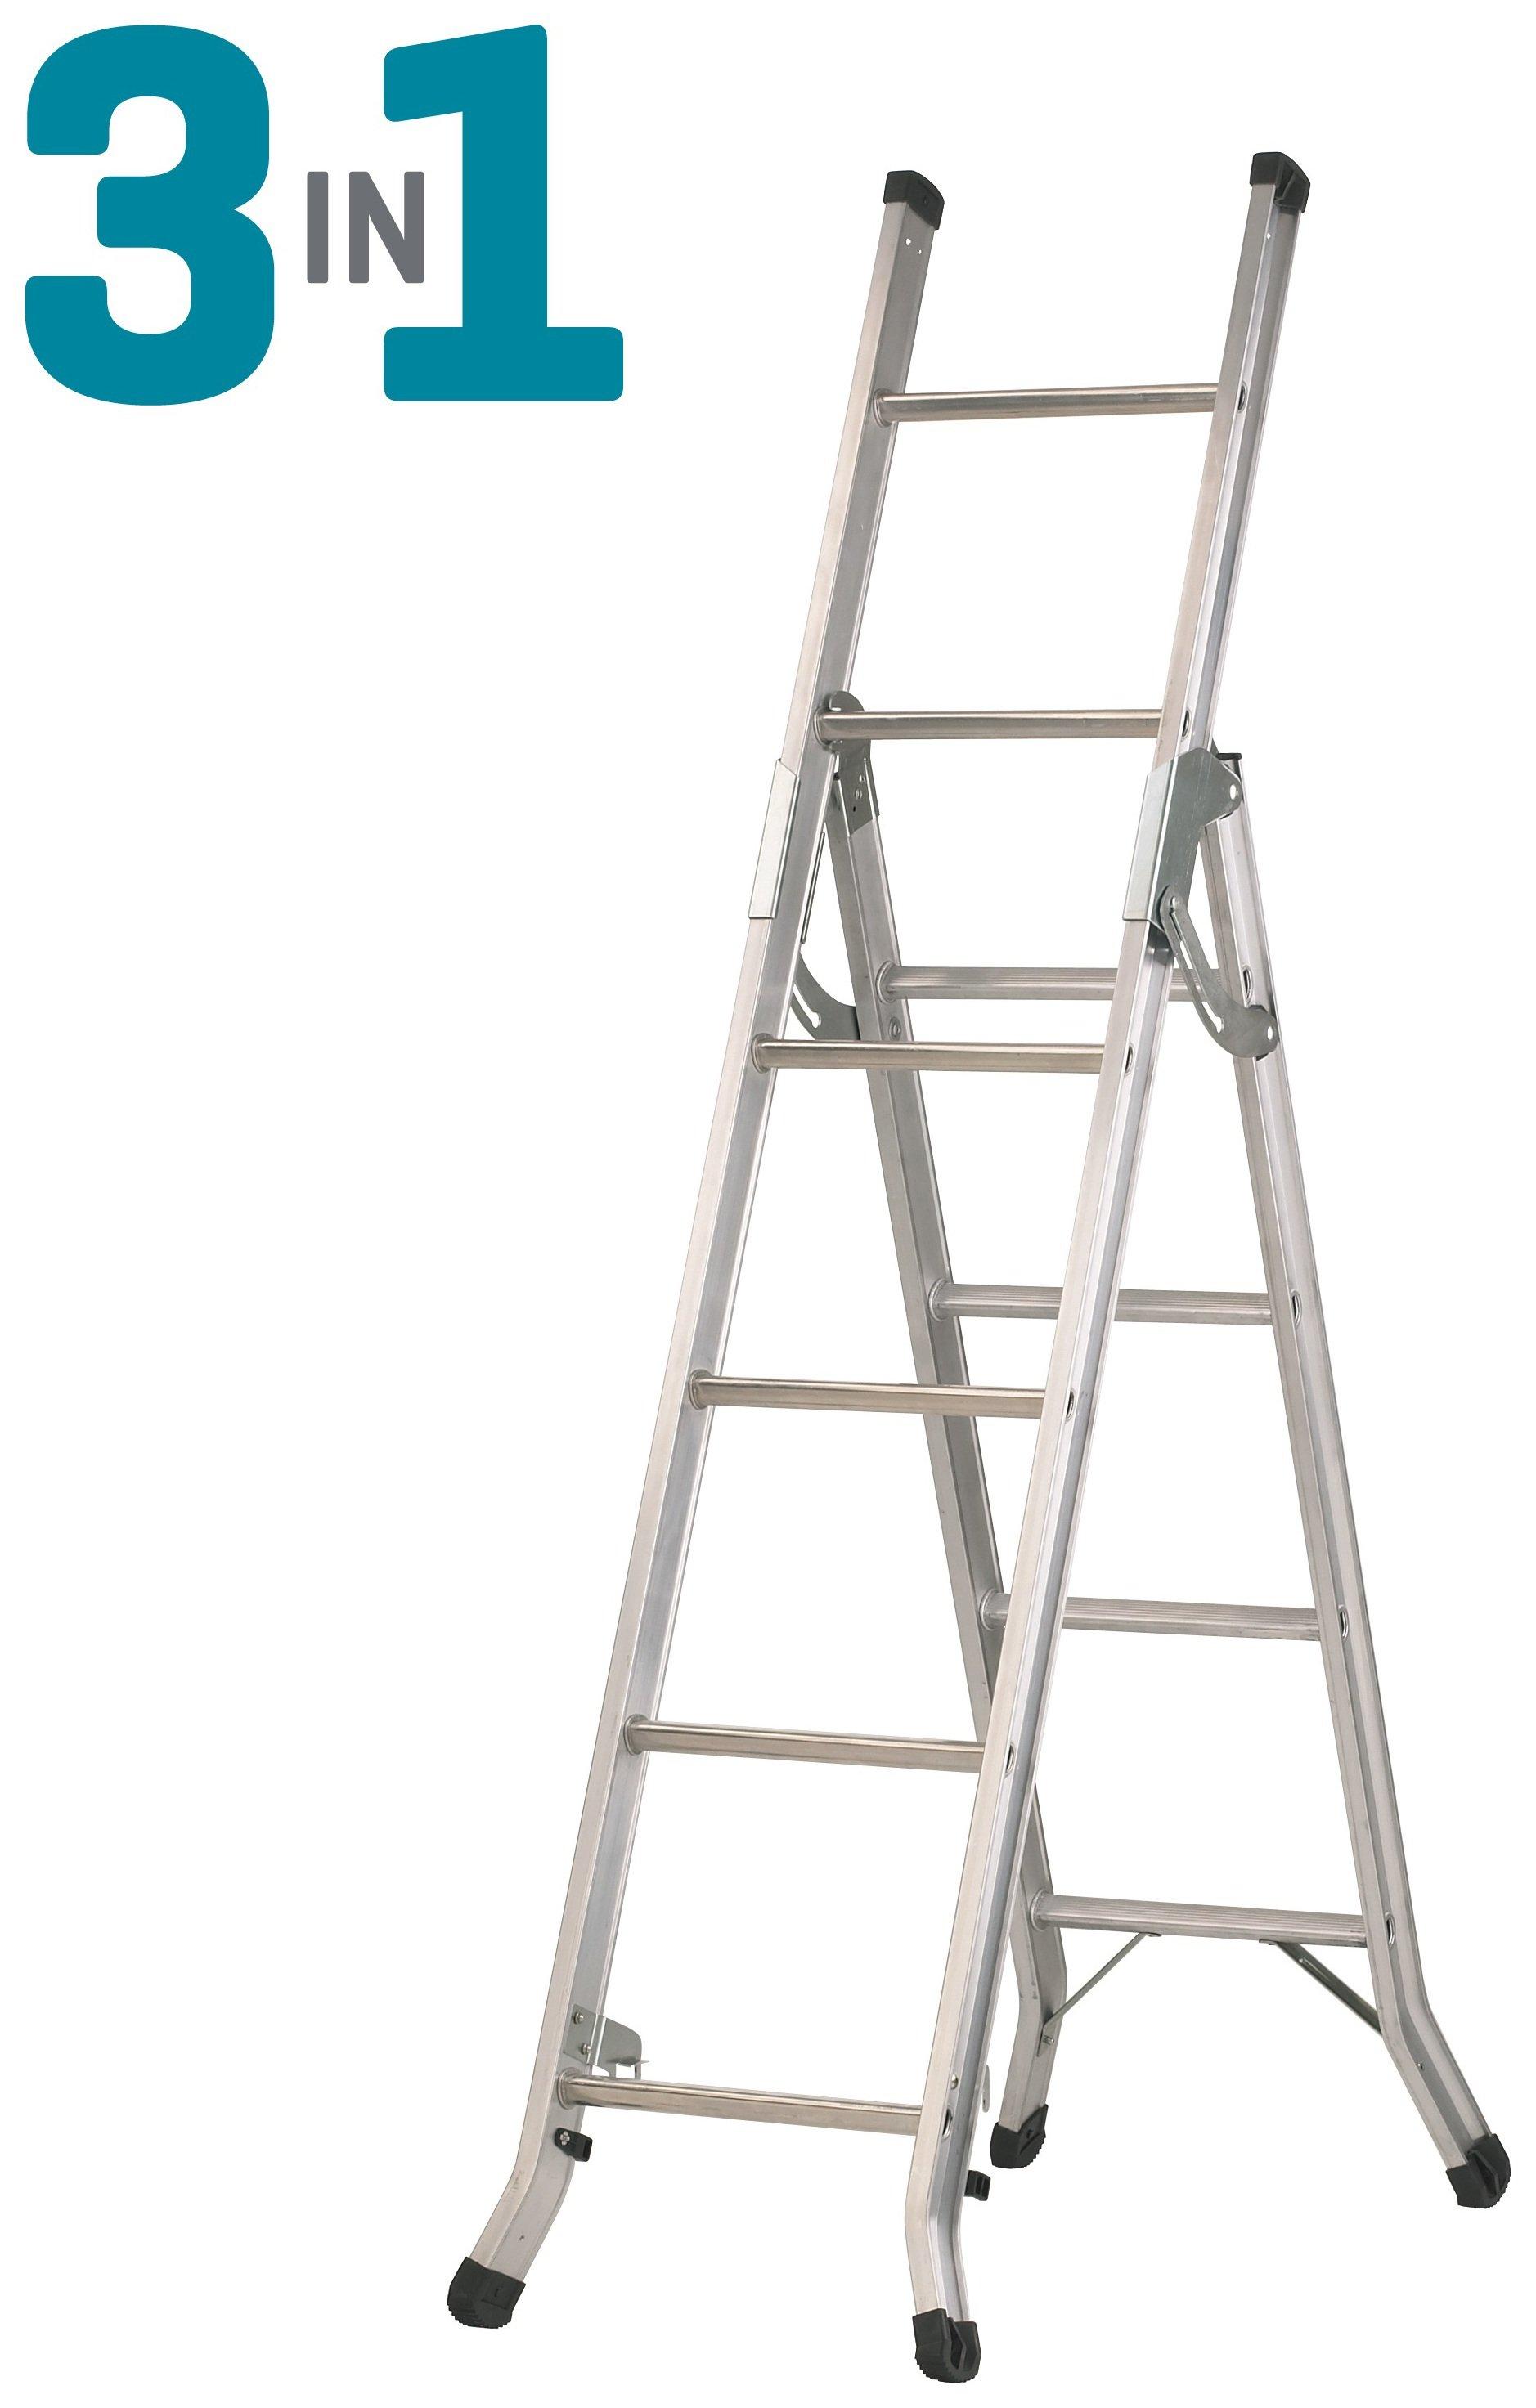 Abru - 3 Way Combination Ladder 340m - Max SWH